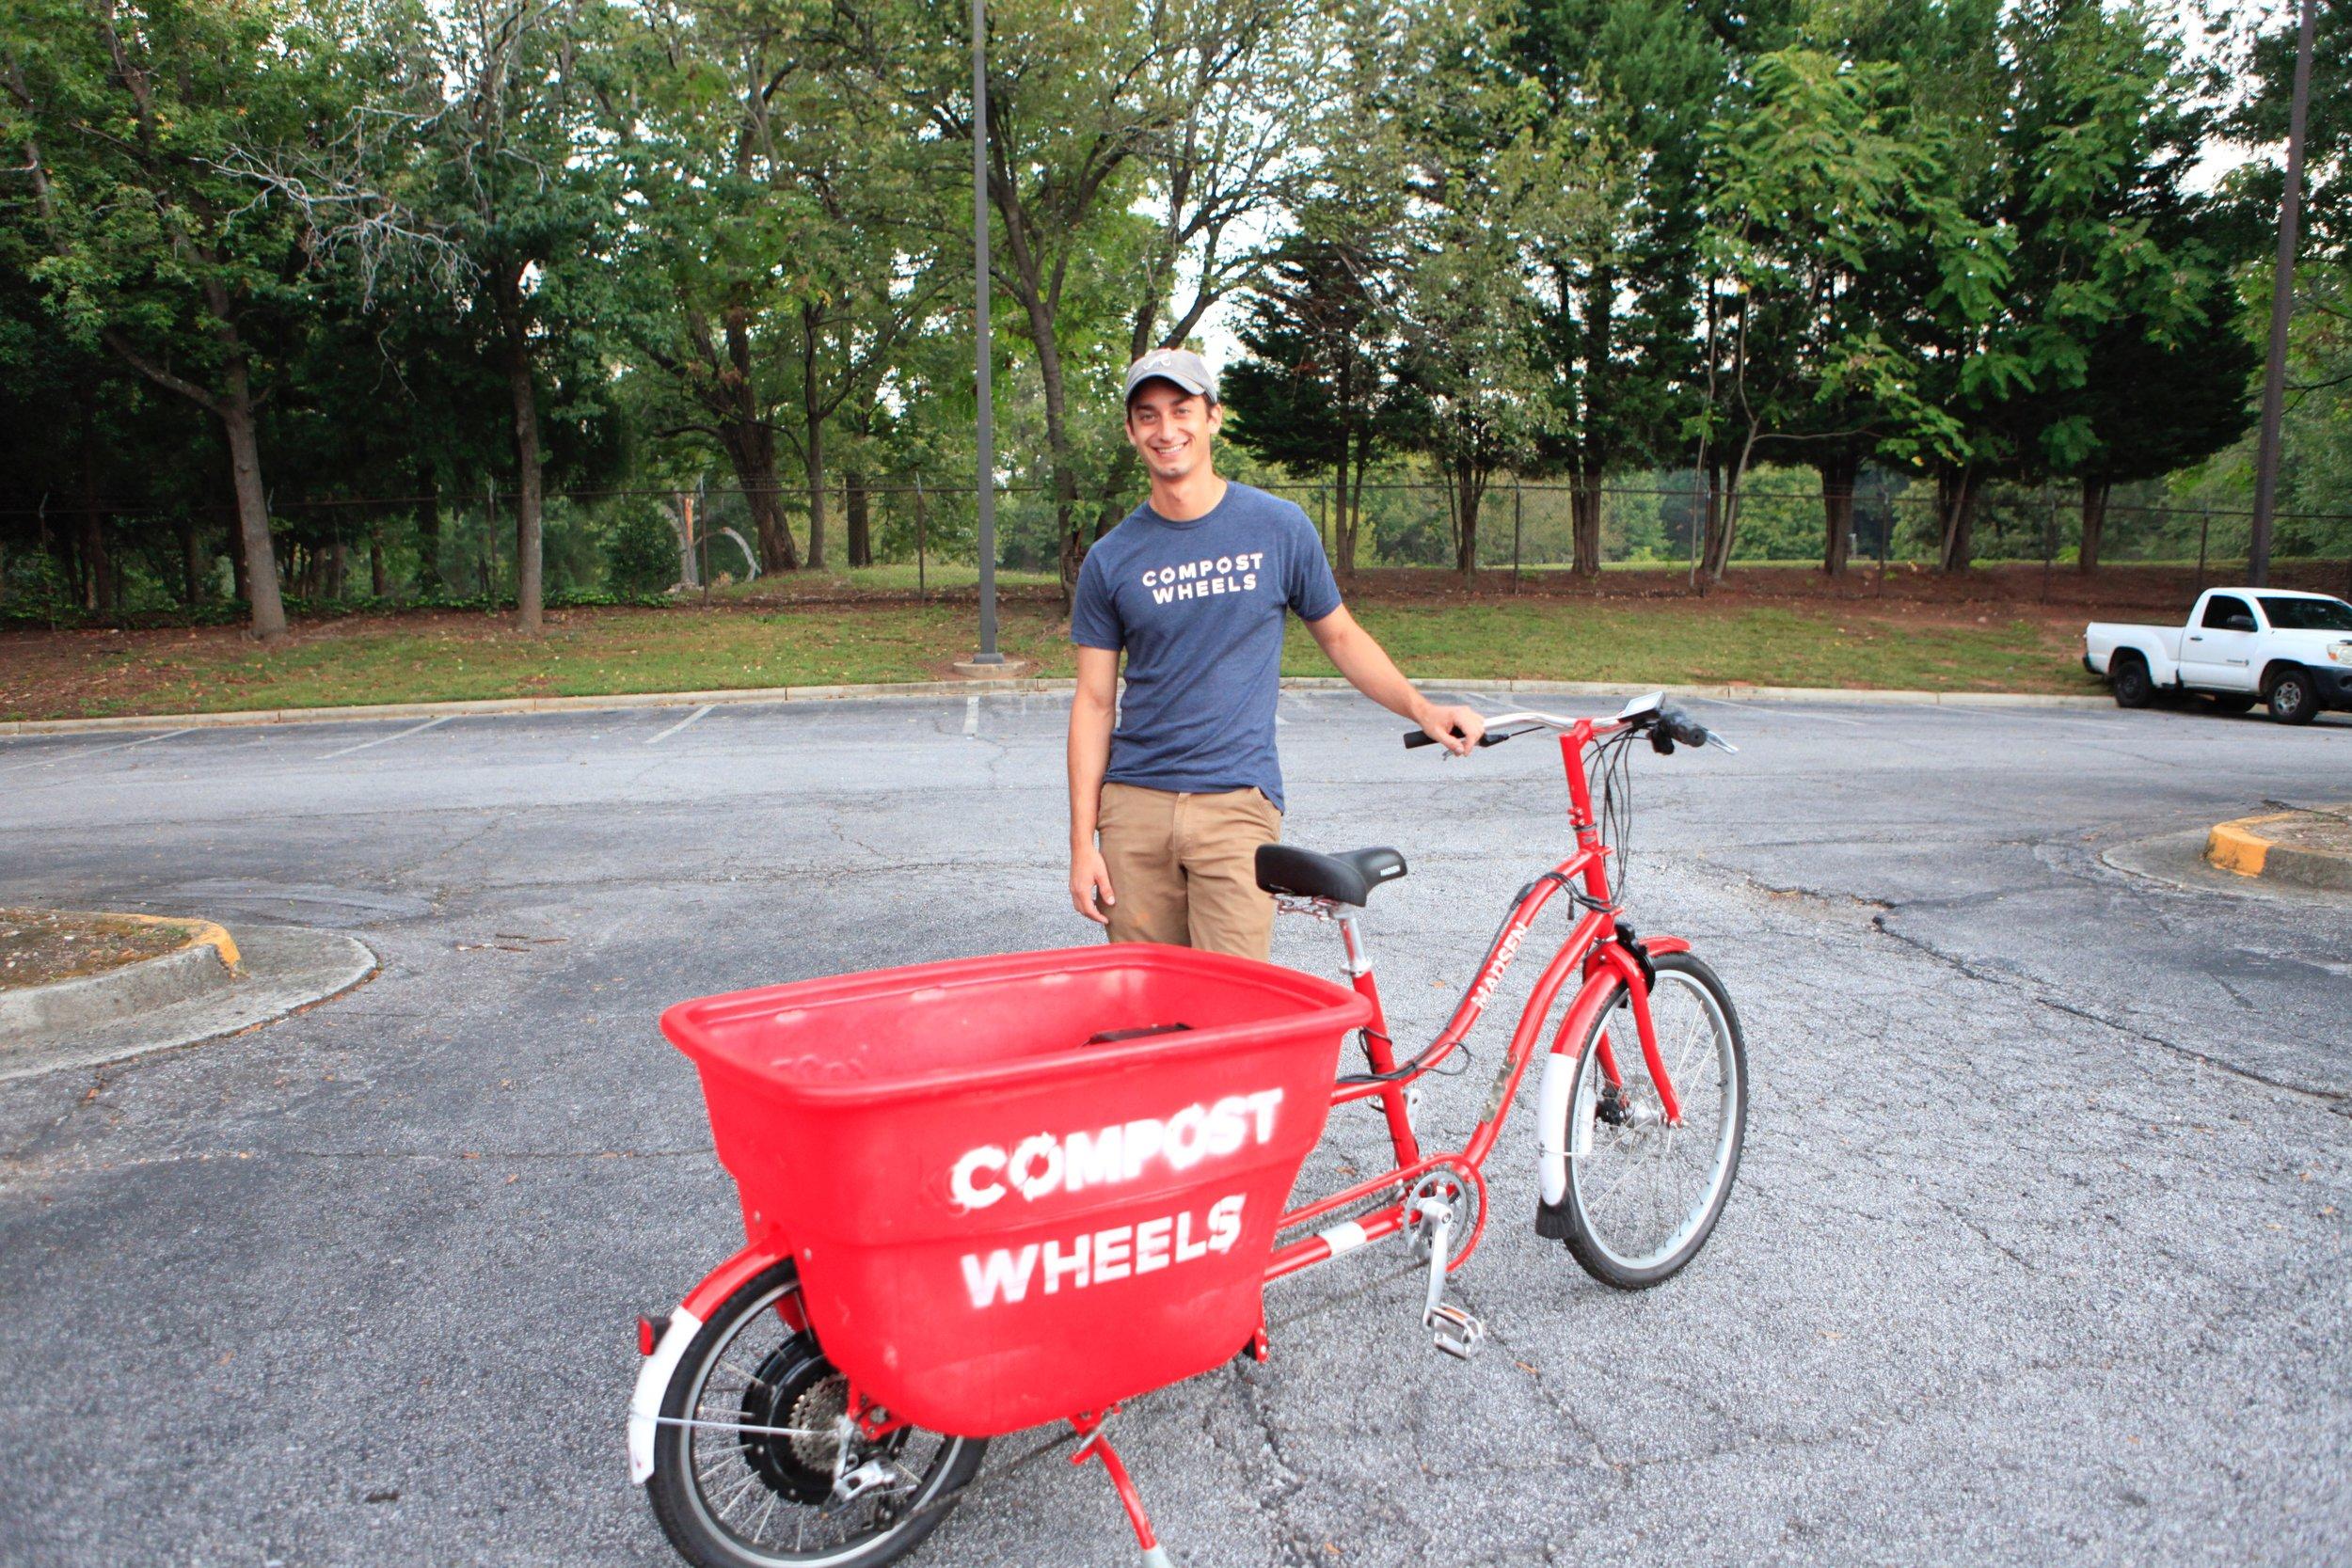 Compostwheels Founder David Paull